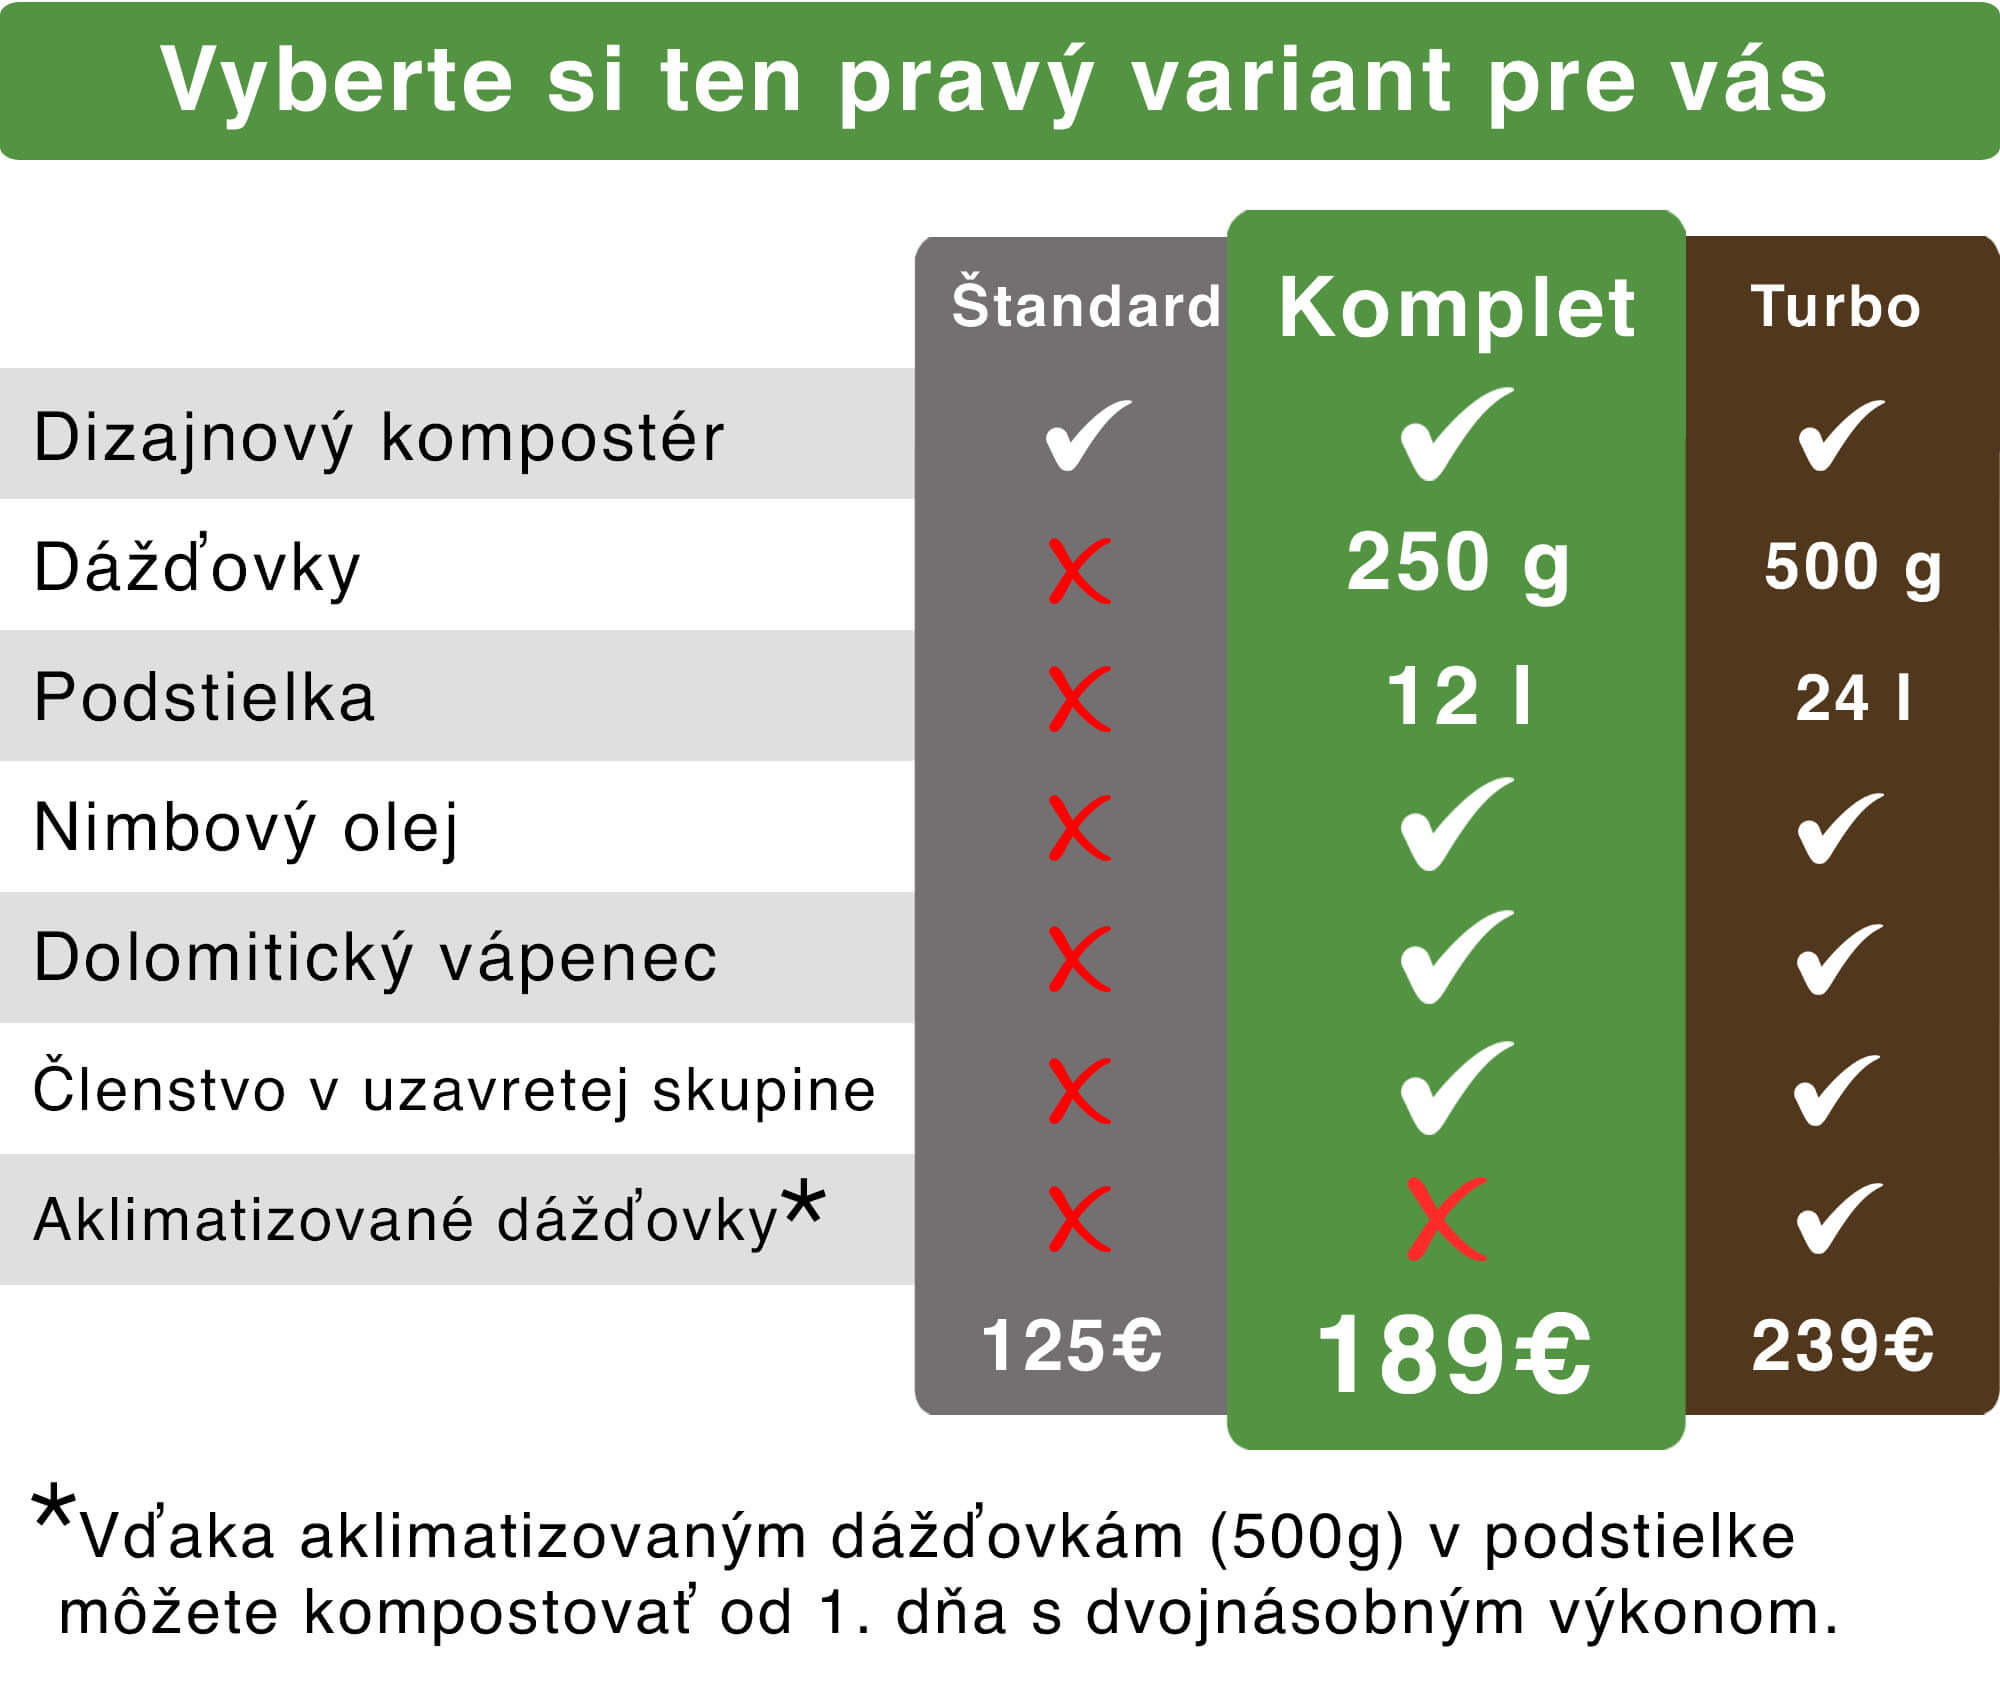 Vermikompost%C3%A9r%20Urbalive%20Komplet%20Turbo%20%C5%A0tandard%20Kompostujme